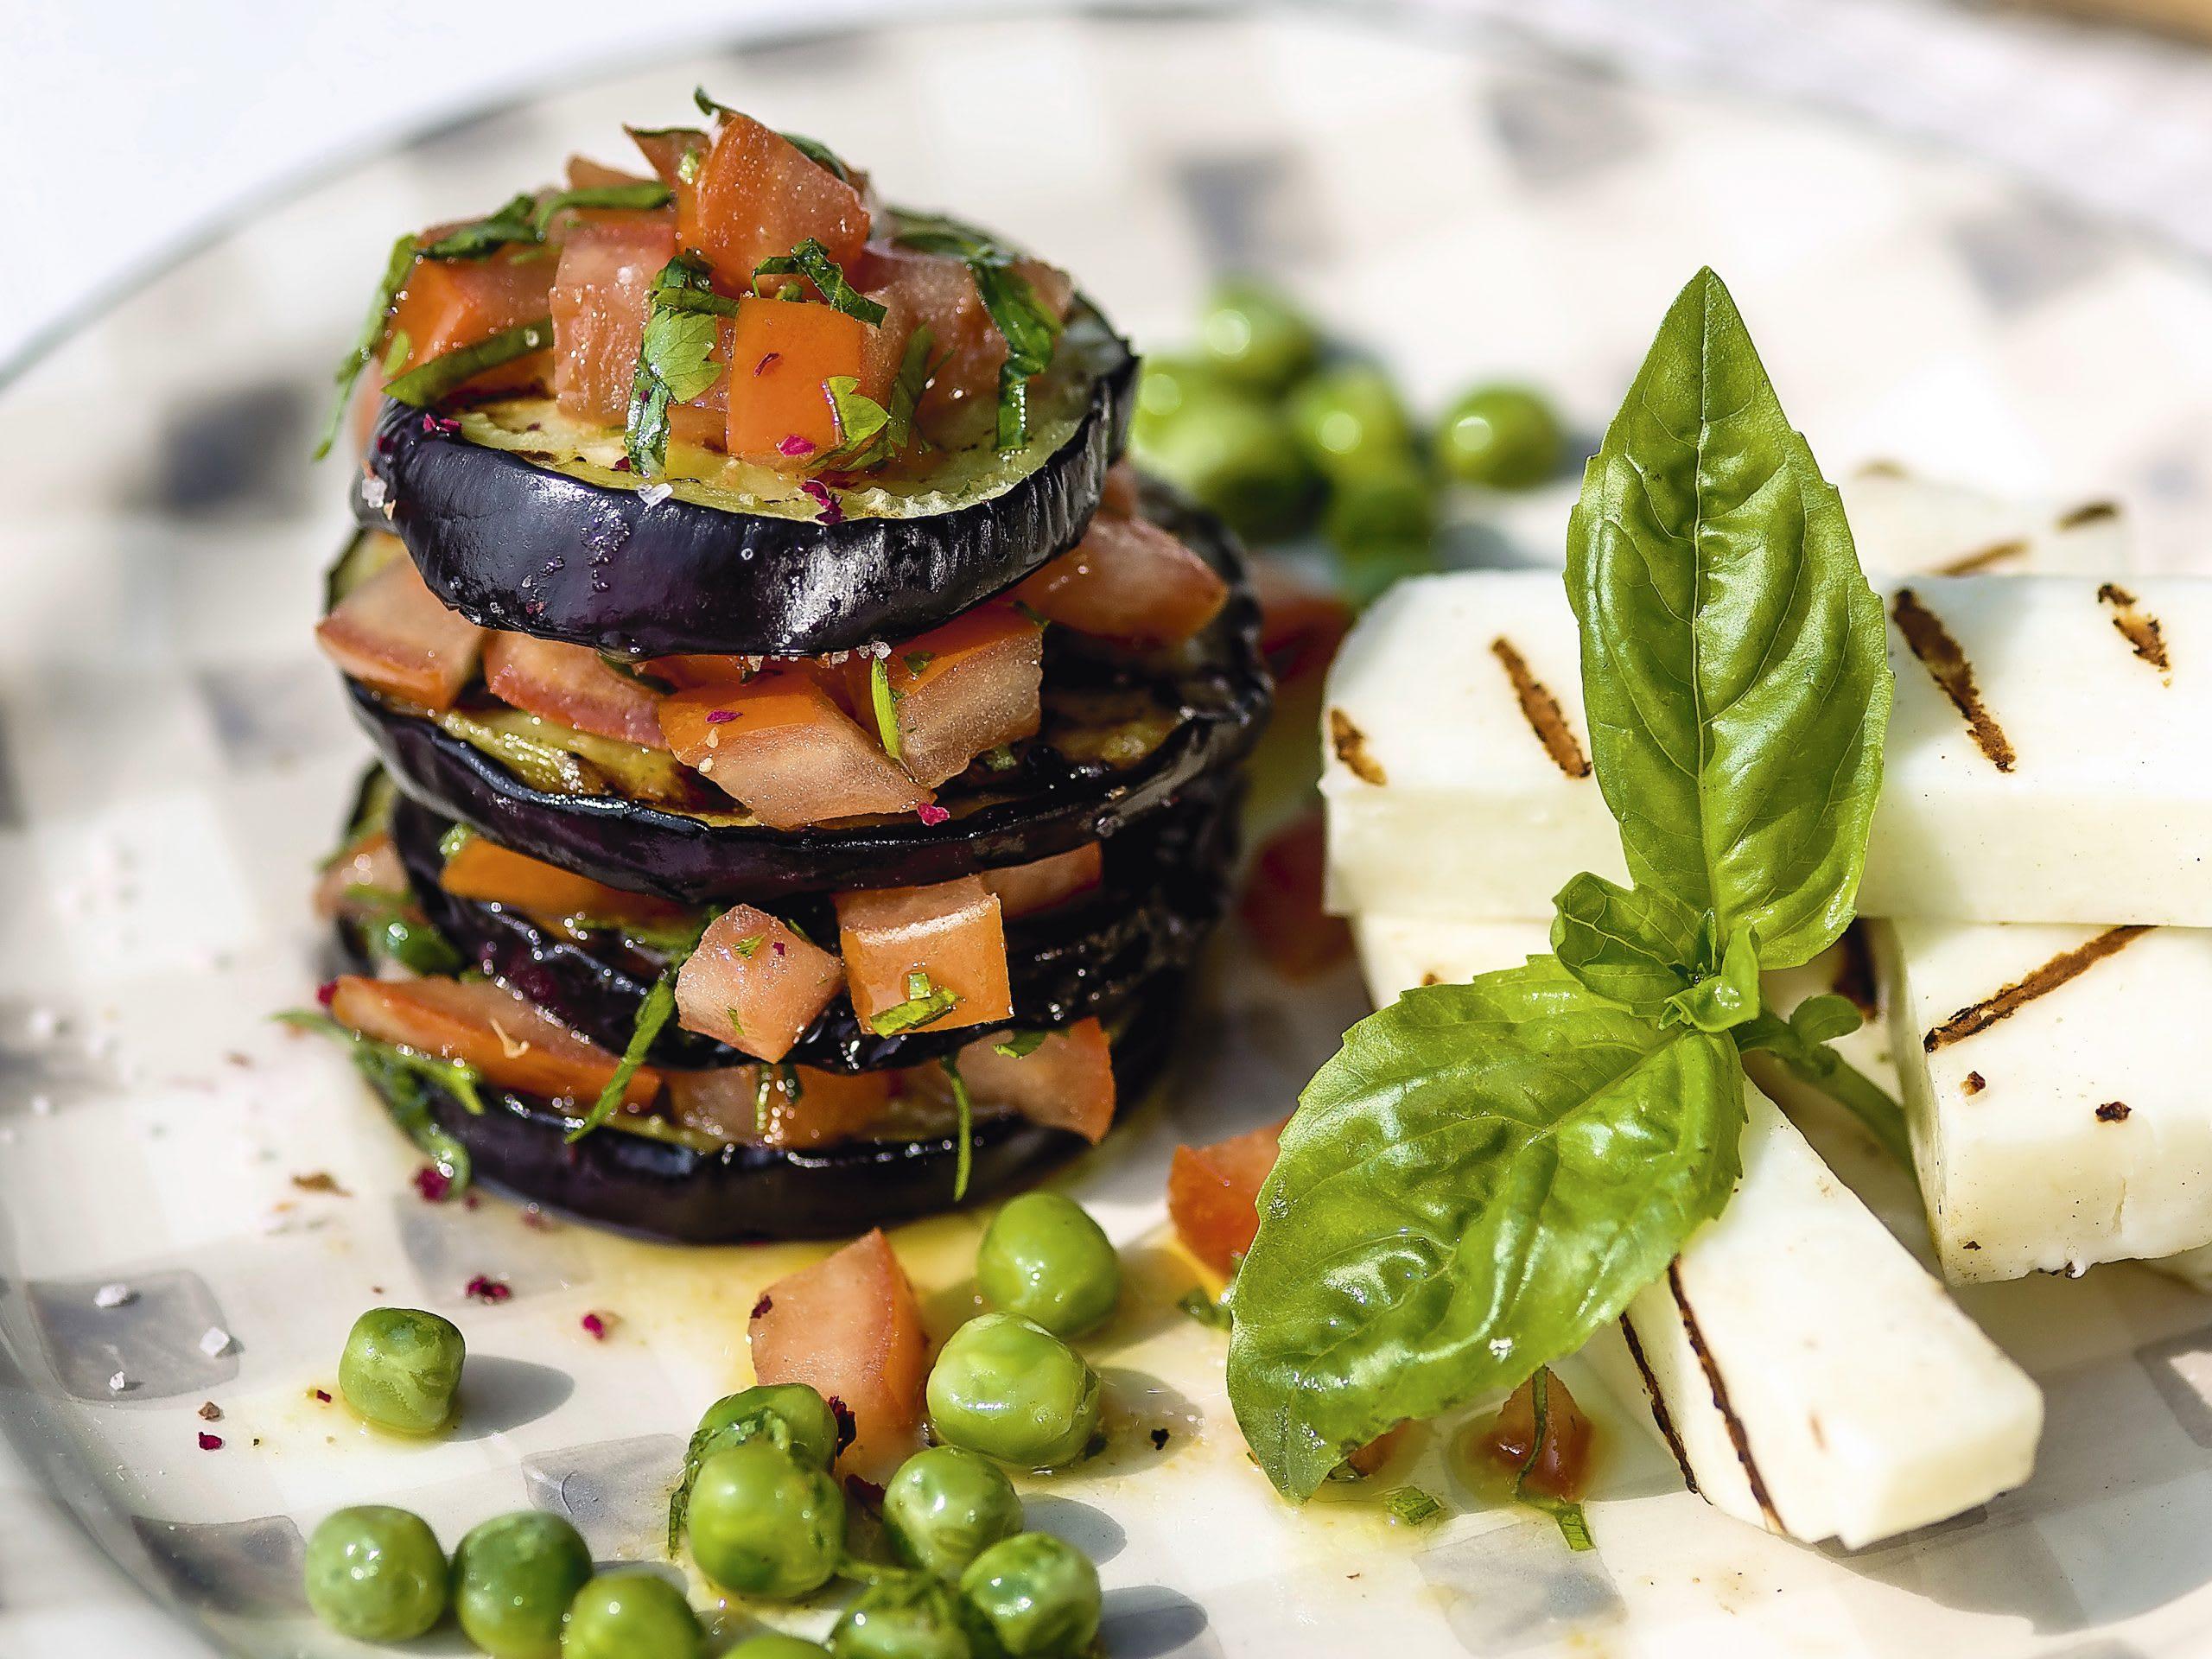 Millefeuille tomates-aubergines et fromage grillé